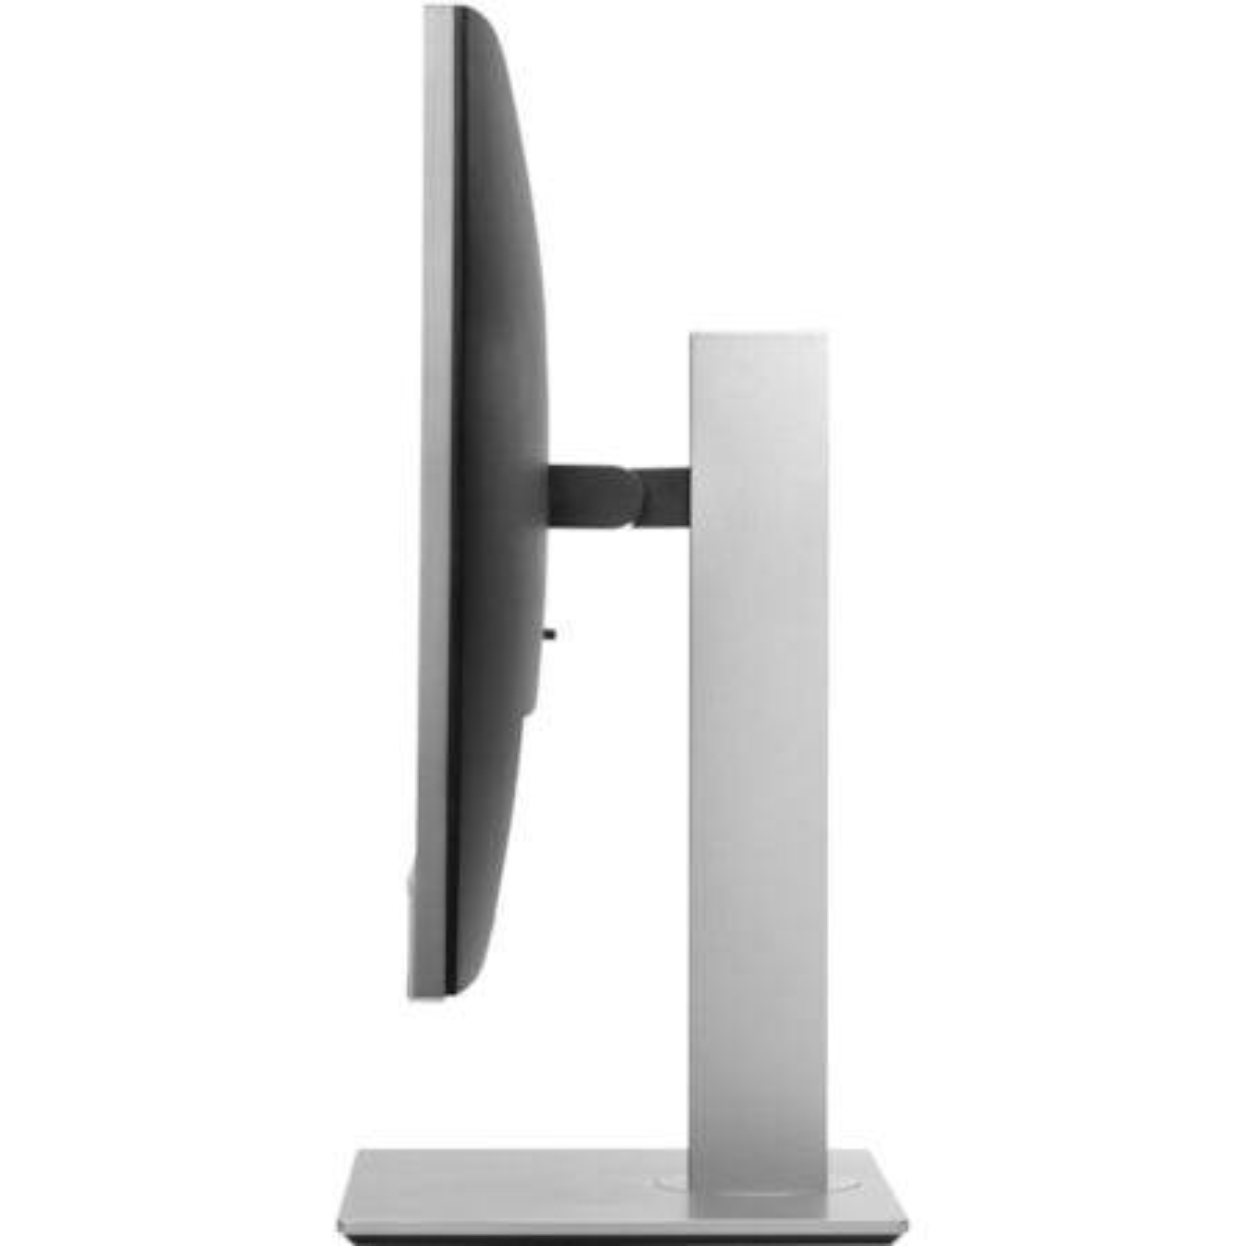 "HP Business E243m 60.5 cm (23.8"") Full HD LED LCD Monitor - 16:9 - Silver, Black"